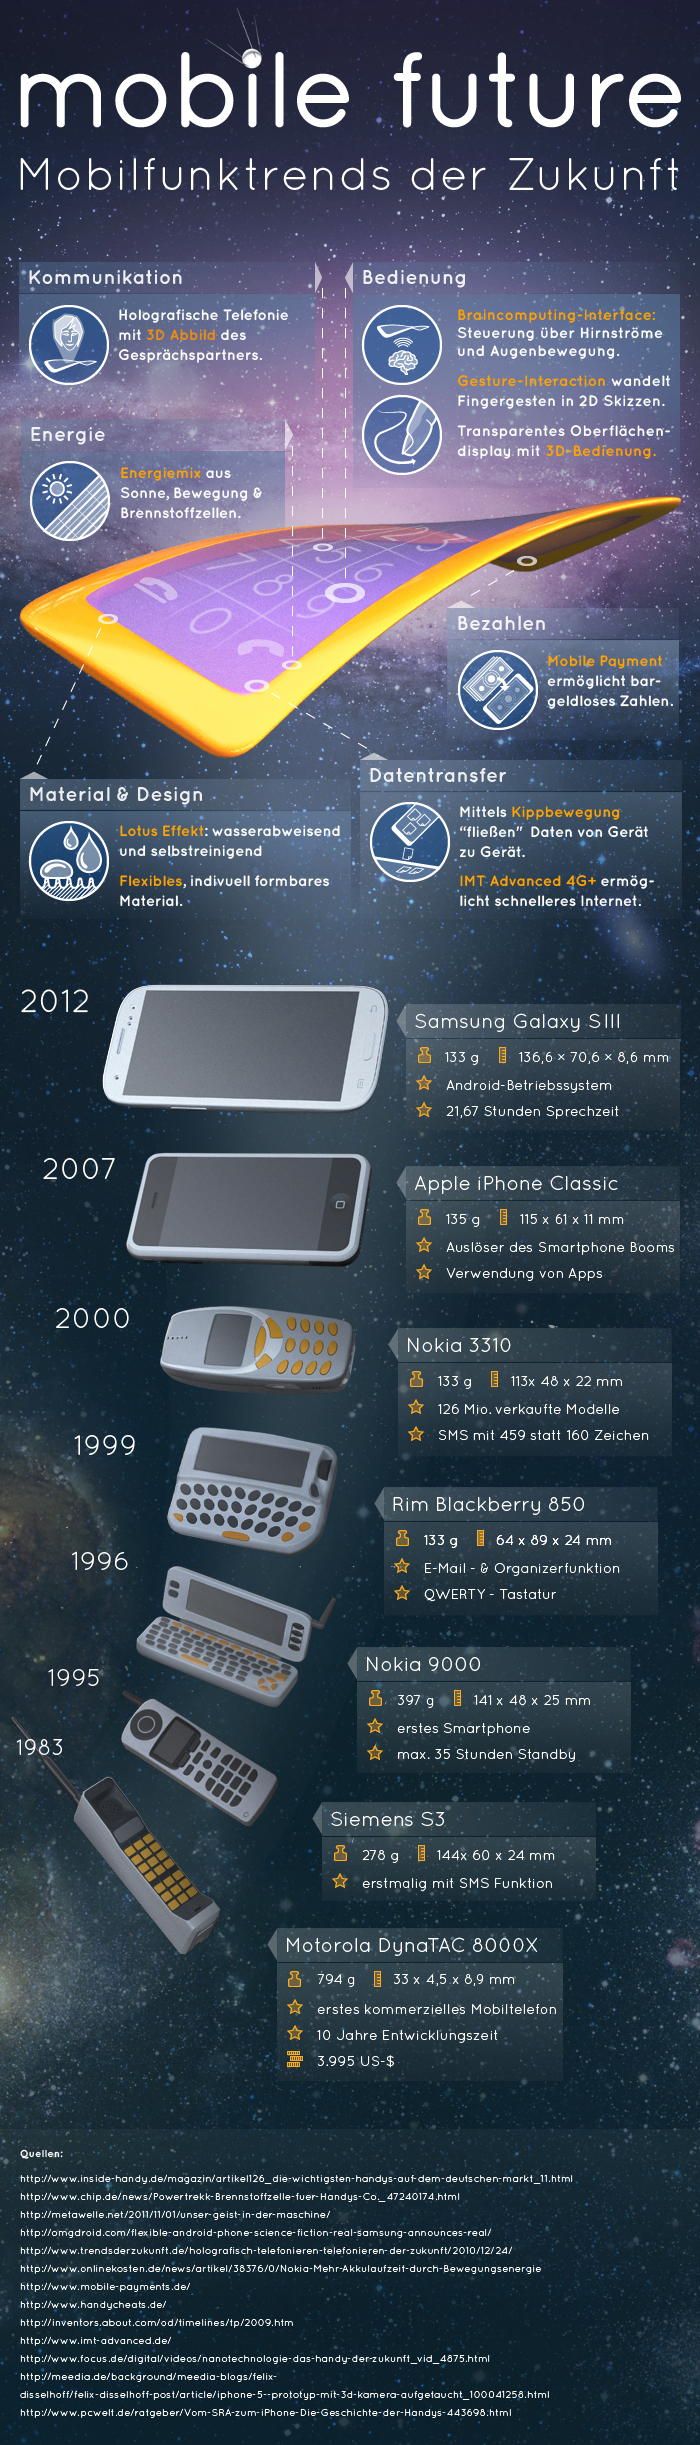 Mobile_Future-Mobilfunktrends_der_Zukunft